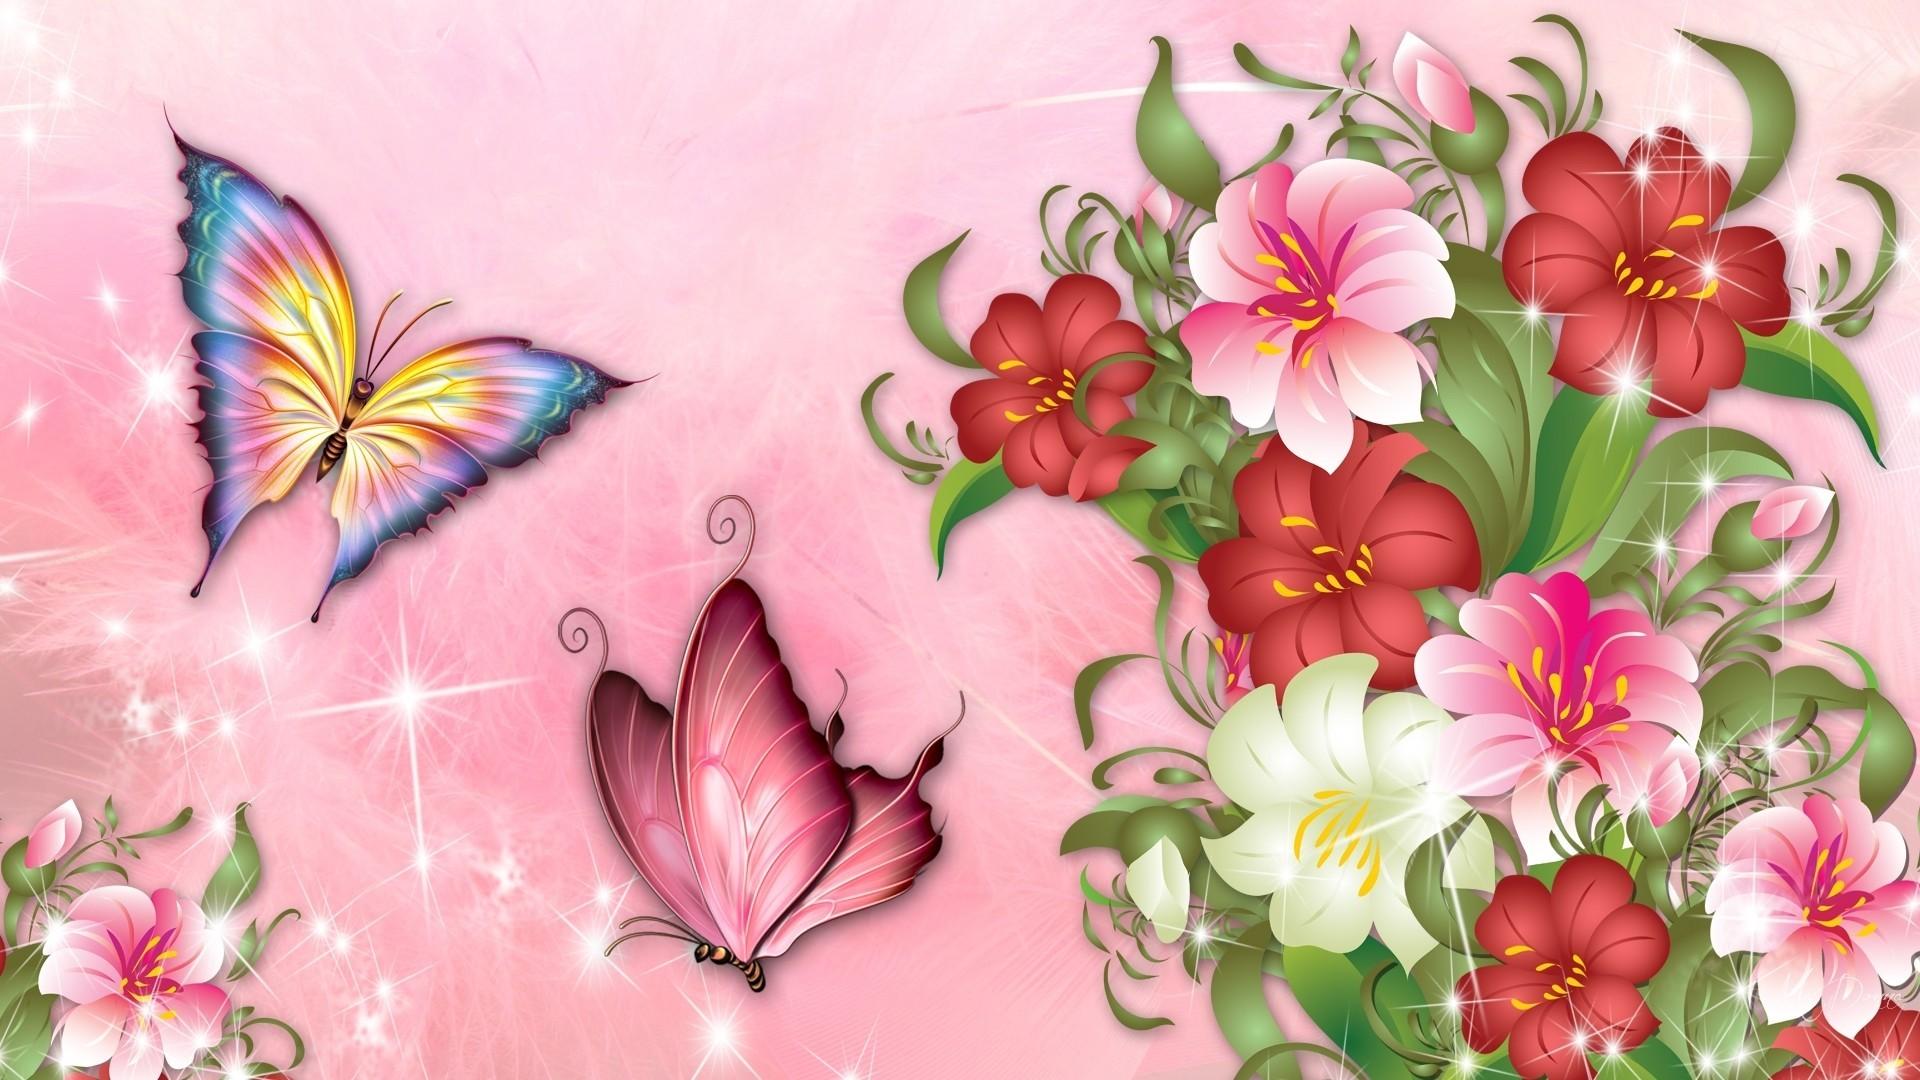 Res: 1920x1080, Blossoms Perona Theme Spring Firefox Blooms Garden Pink Bright Summer  Flowers Butterflies Flower Wallpaper Full Hd